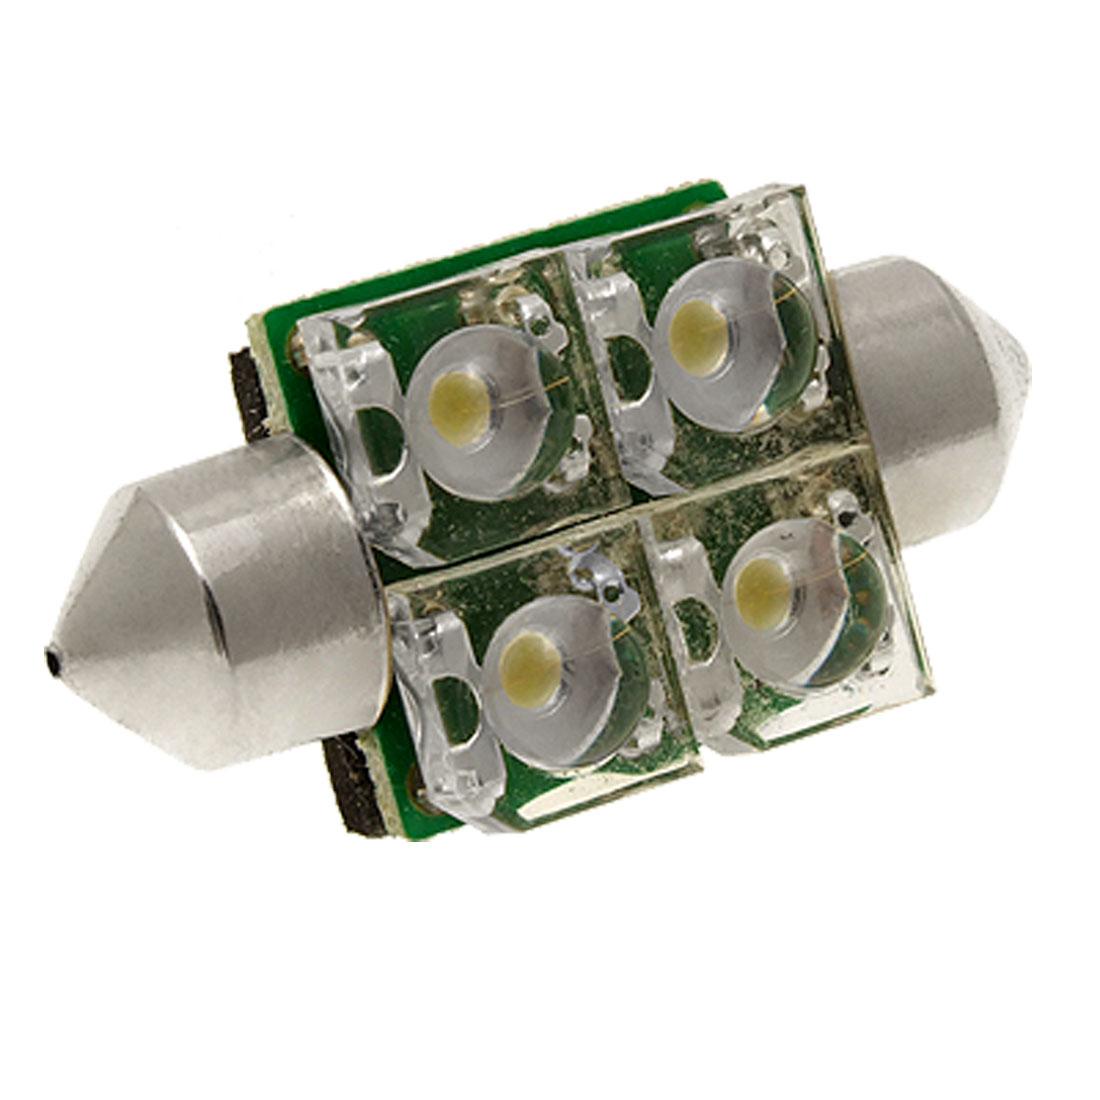 4 LED White Car Auto Bulbs 34mm Dome Light Lighting Lamp internal